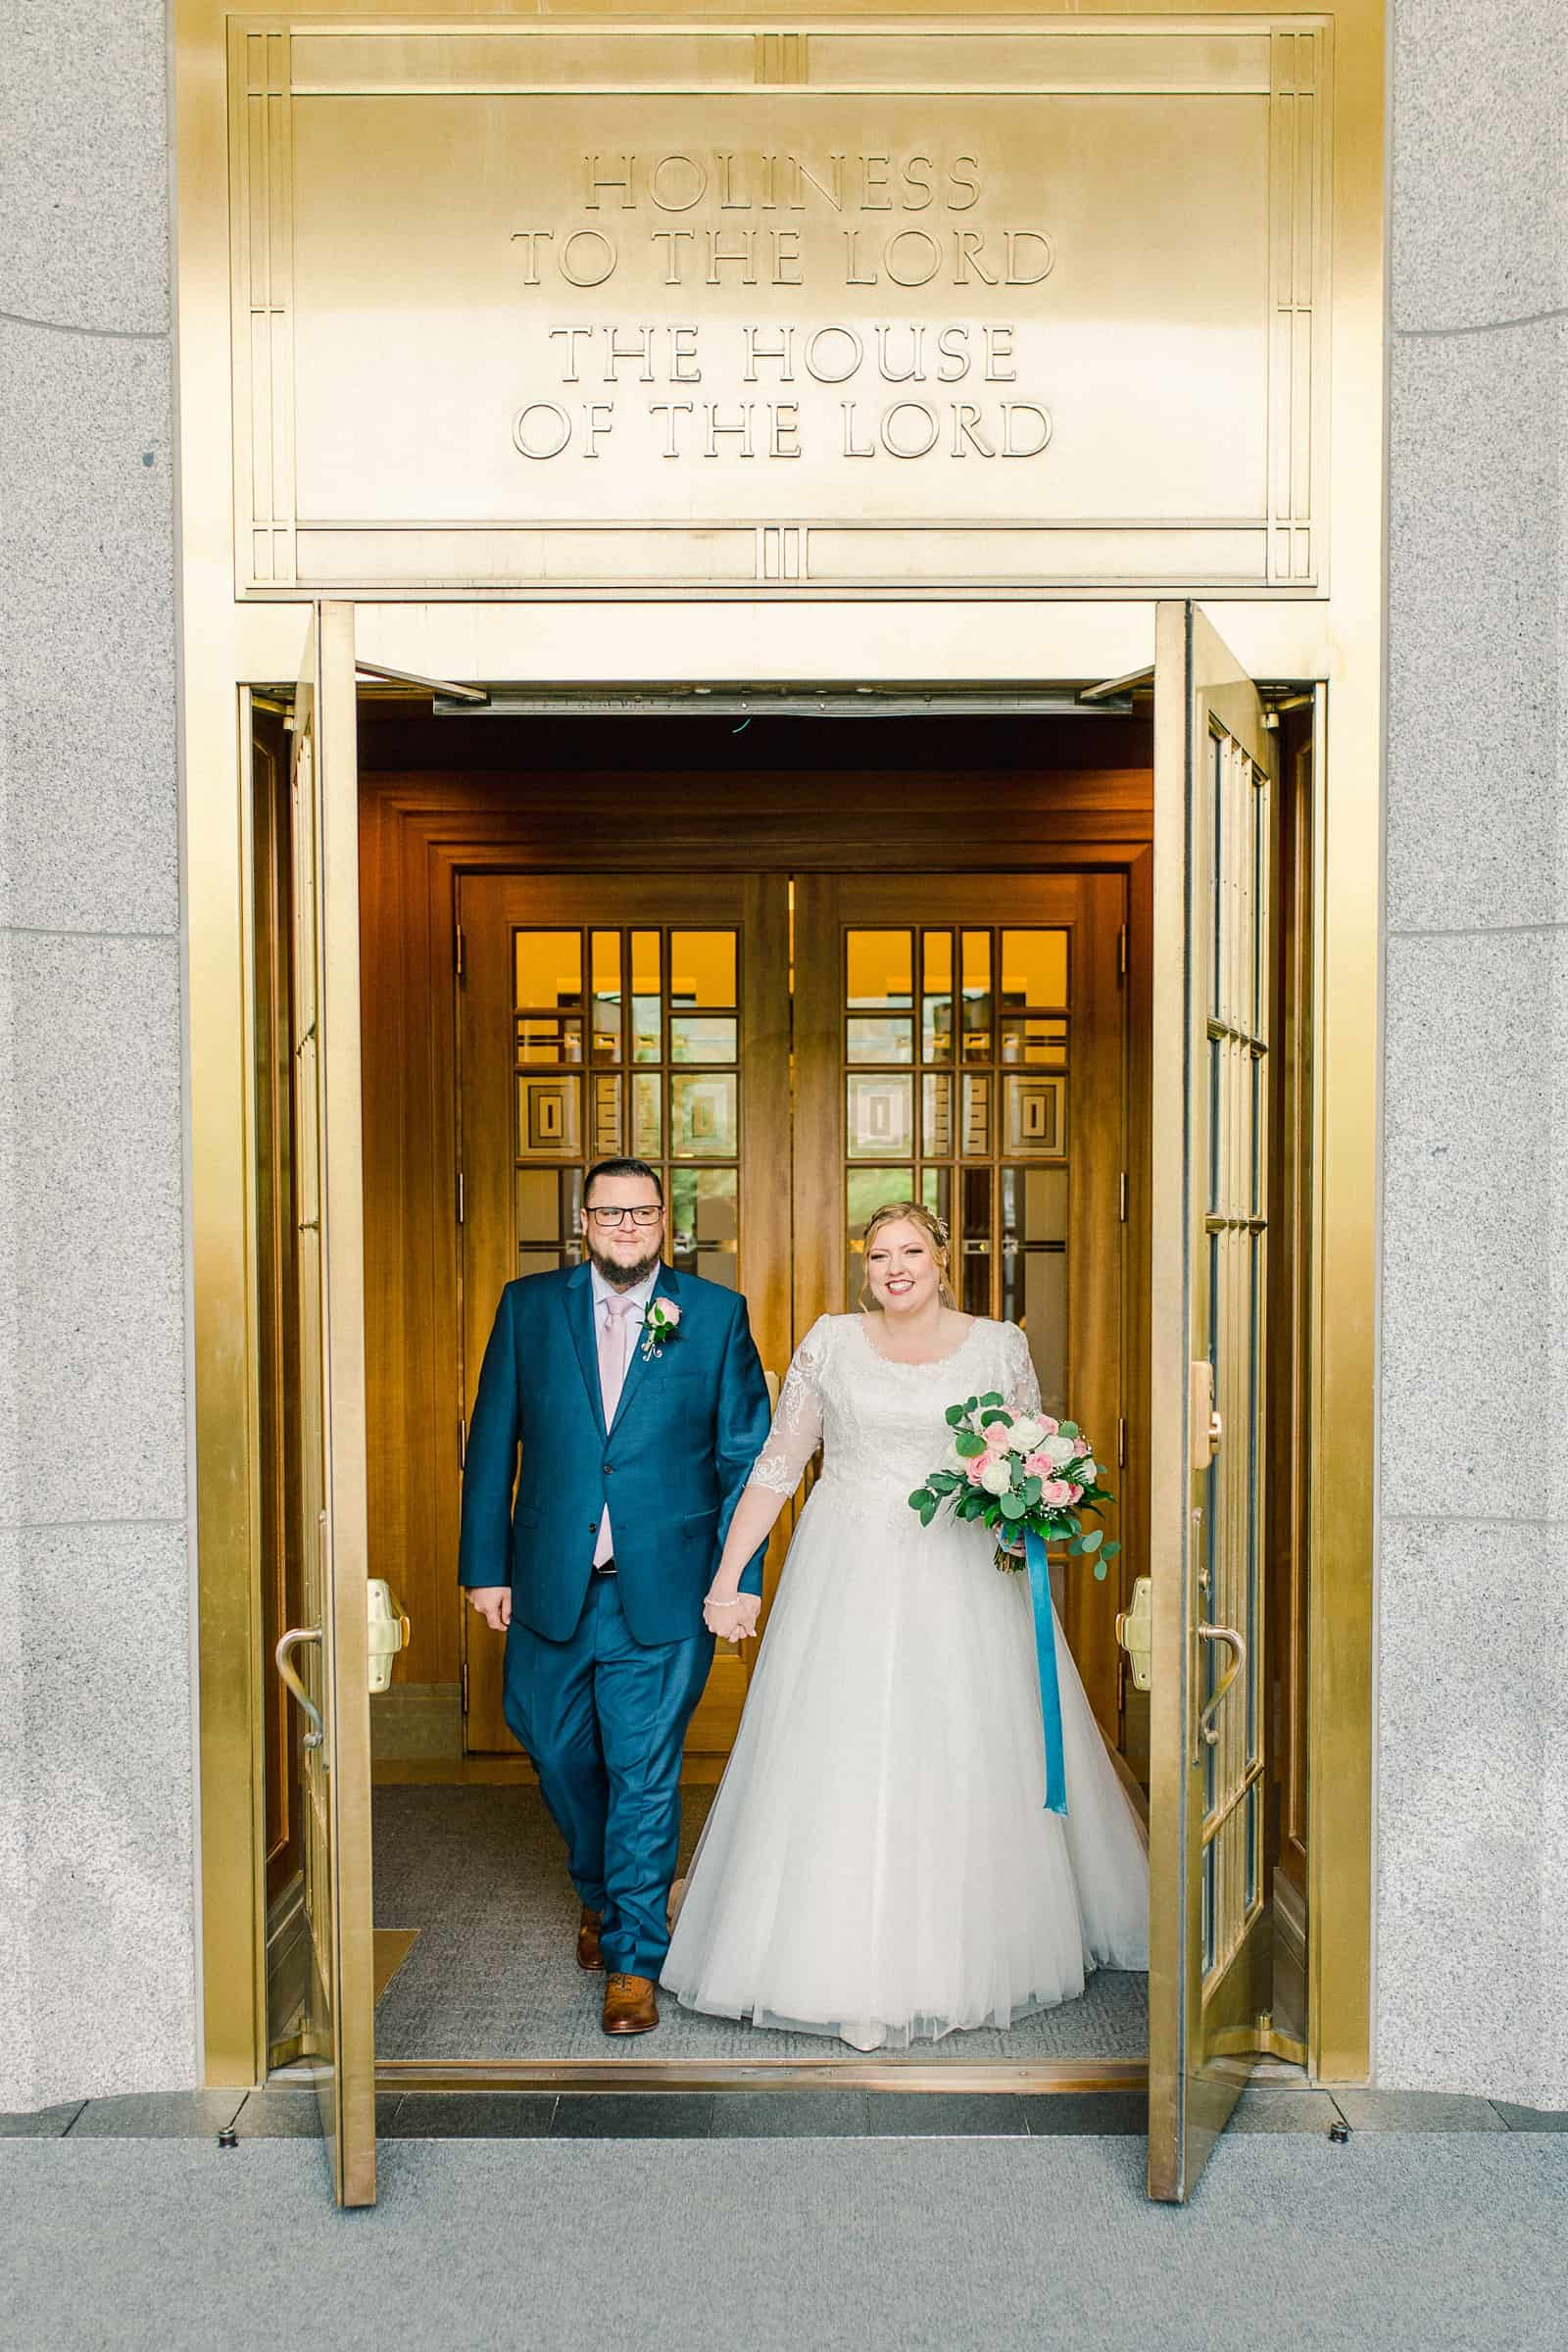 Draper LDS Temple Wedding, Utah wedding photography, summer backyard wedding, bride and groom exit gold doors